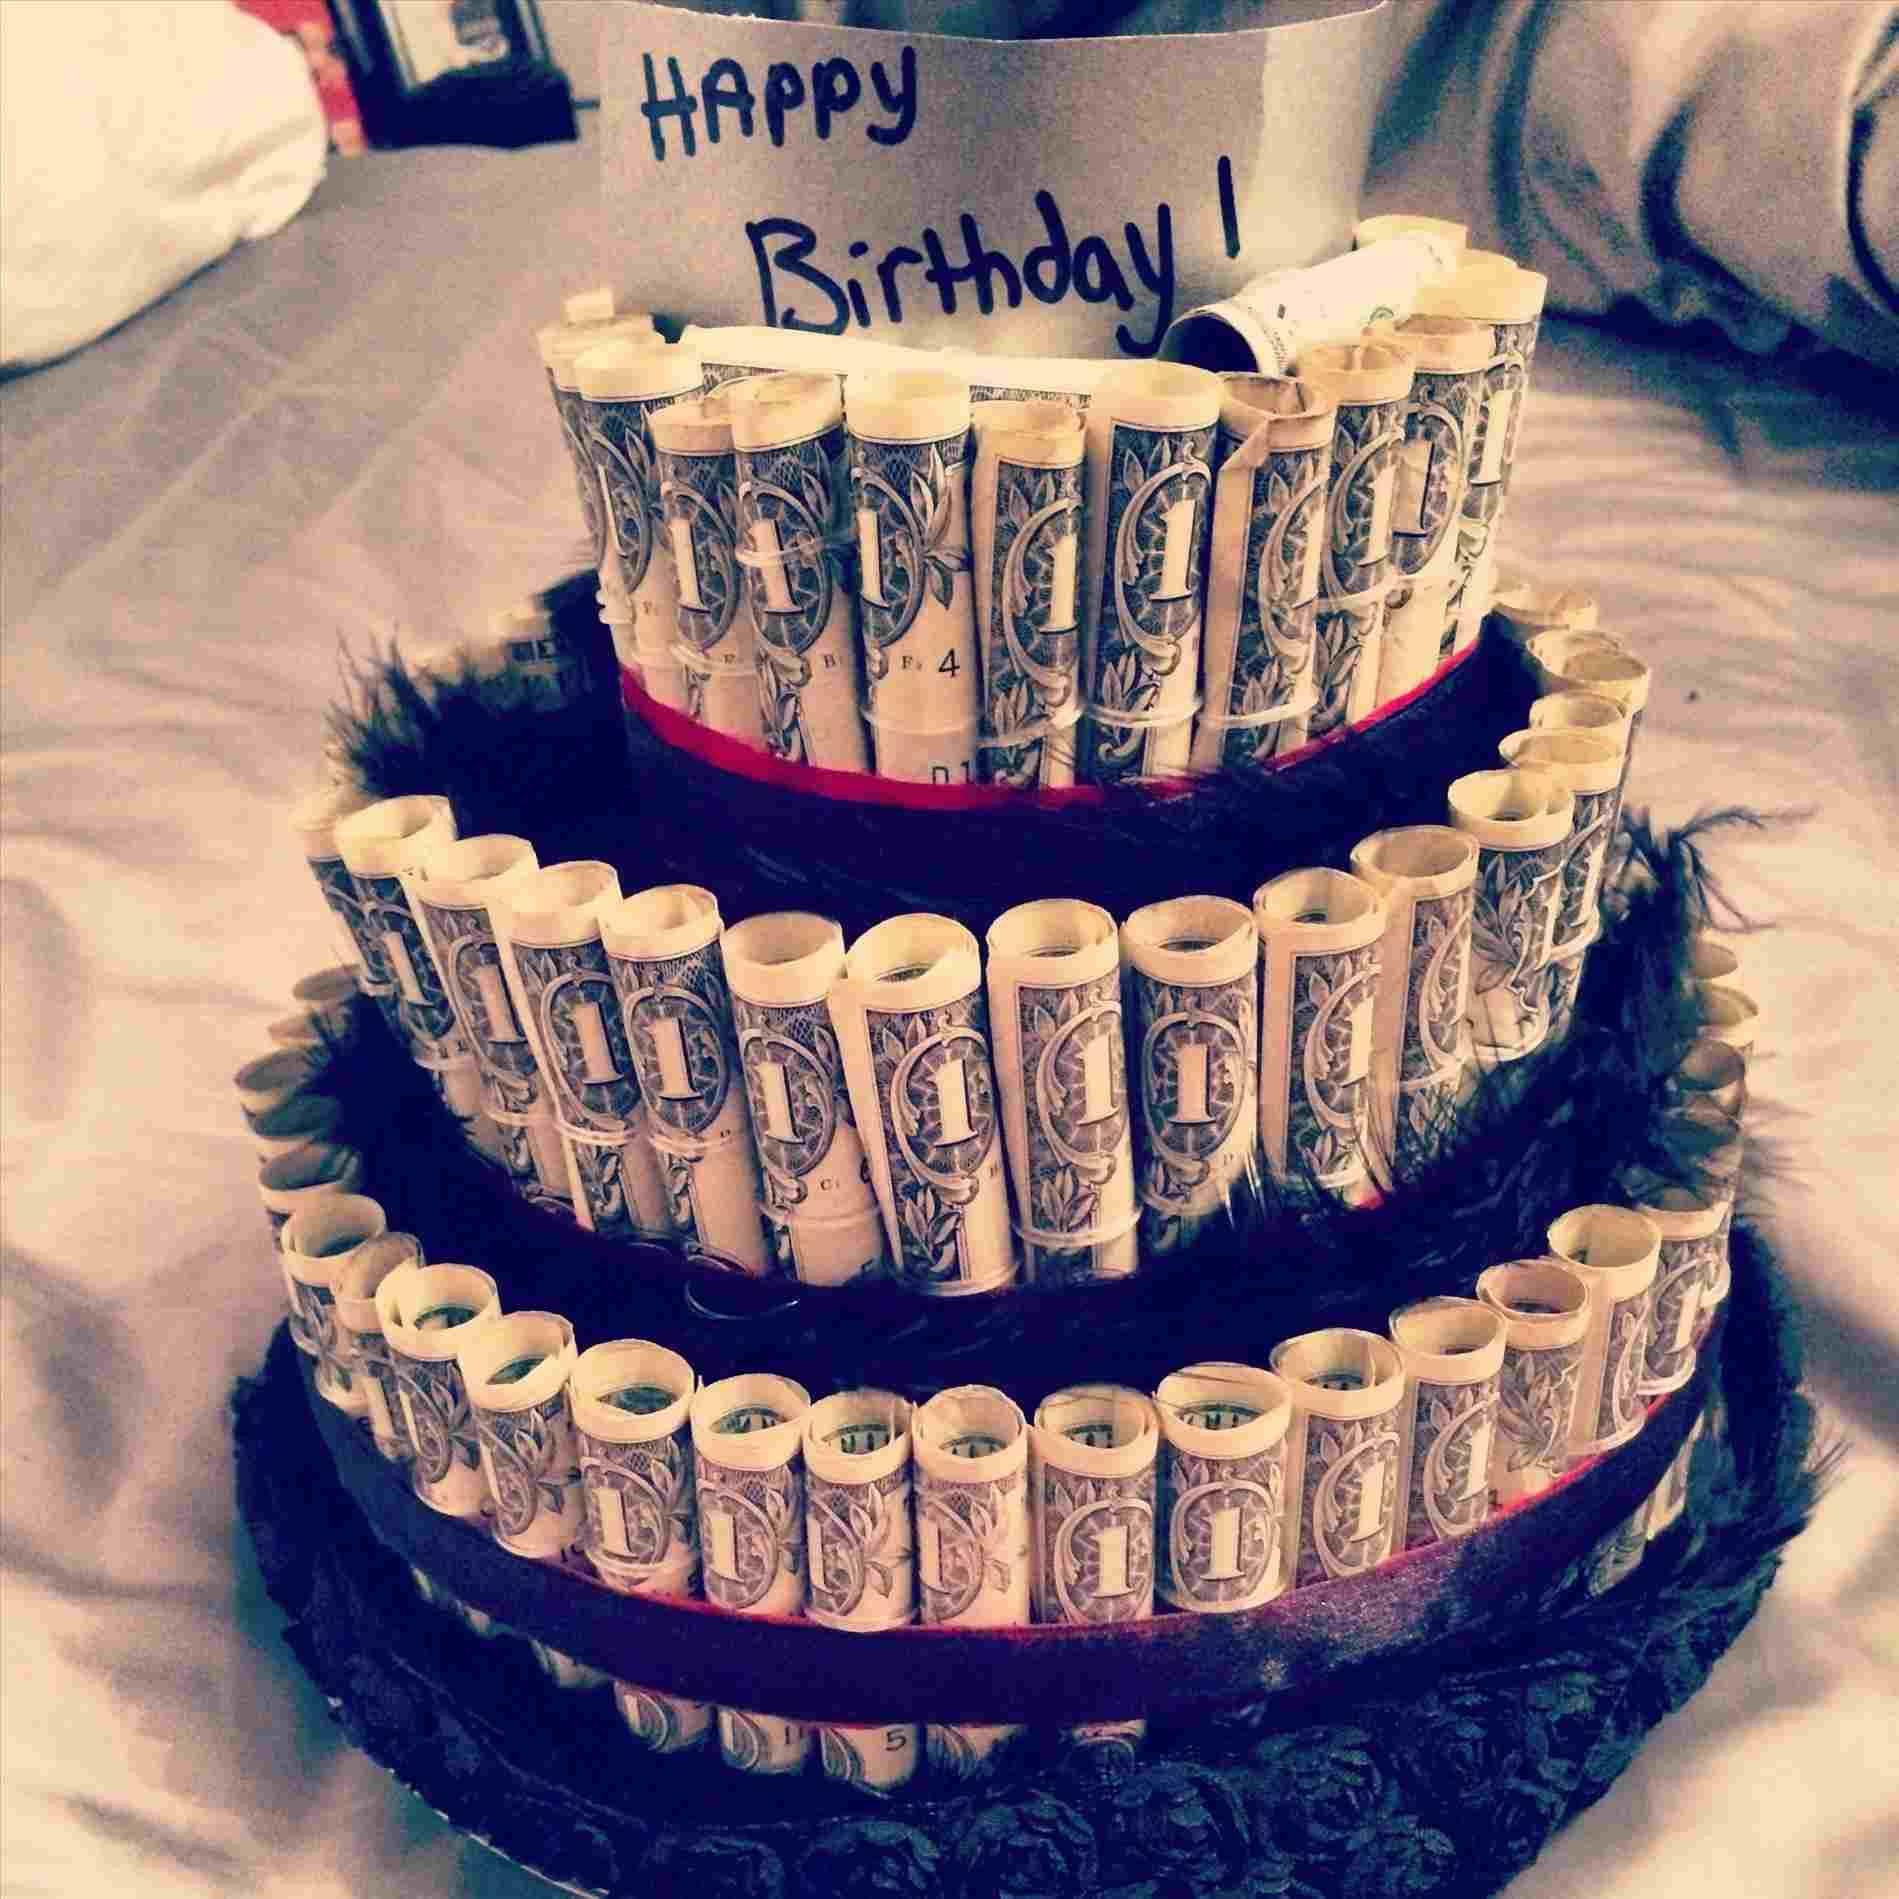 Perfect Birthday Cake For Boyfriend Birthday cake for